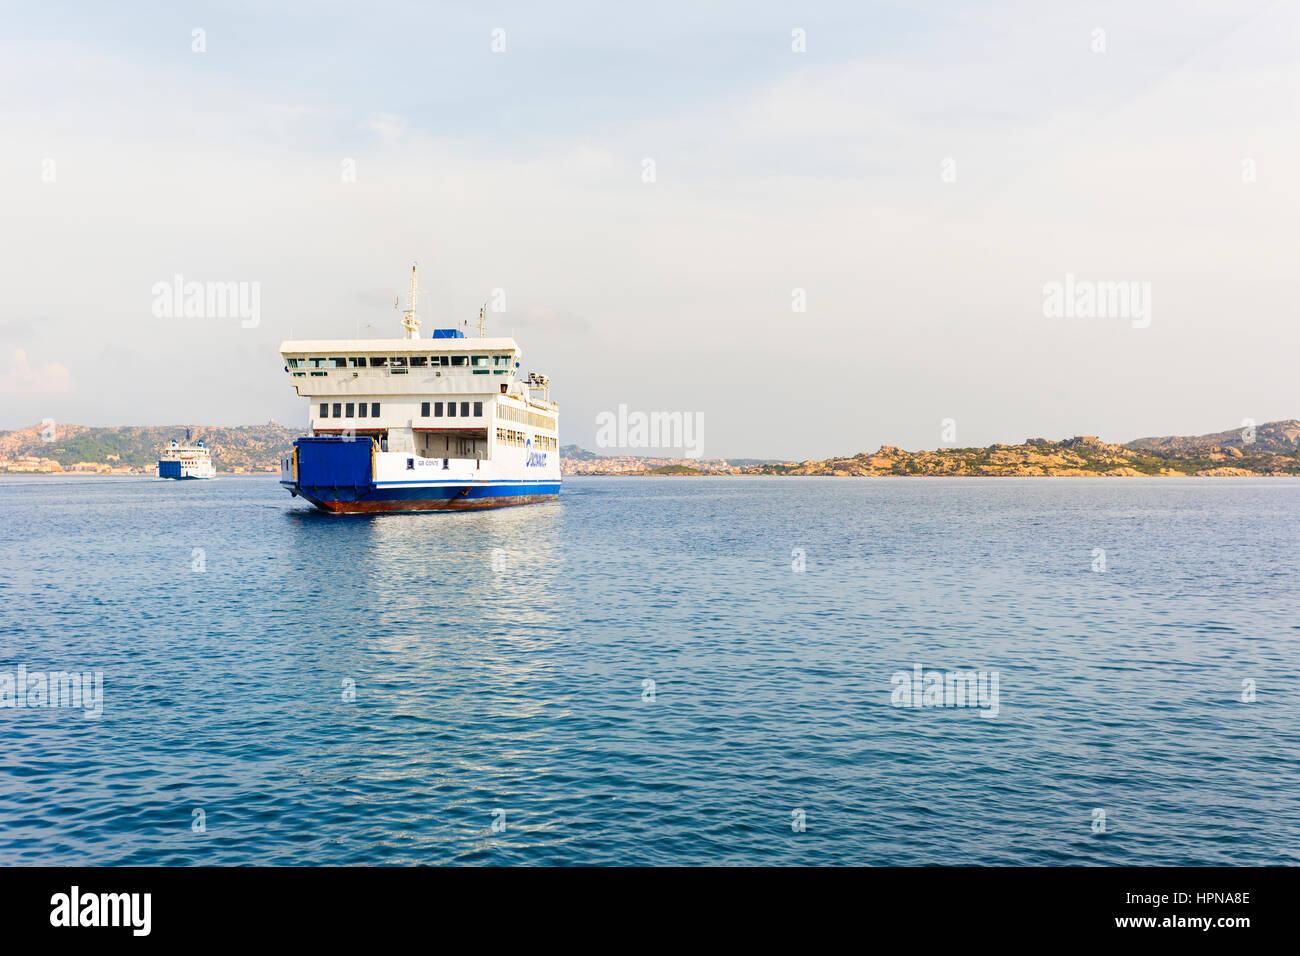 Saremar ferry boat navigates from Palau, (northern Sardinia) to the island of La Maddalena, the main island of the Stock Photo